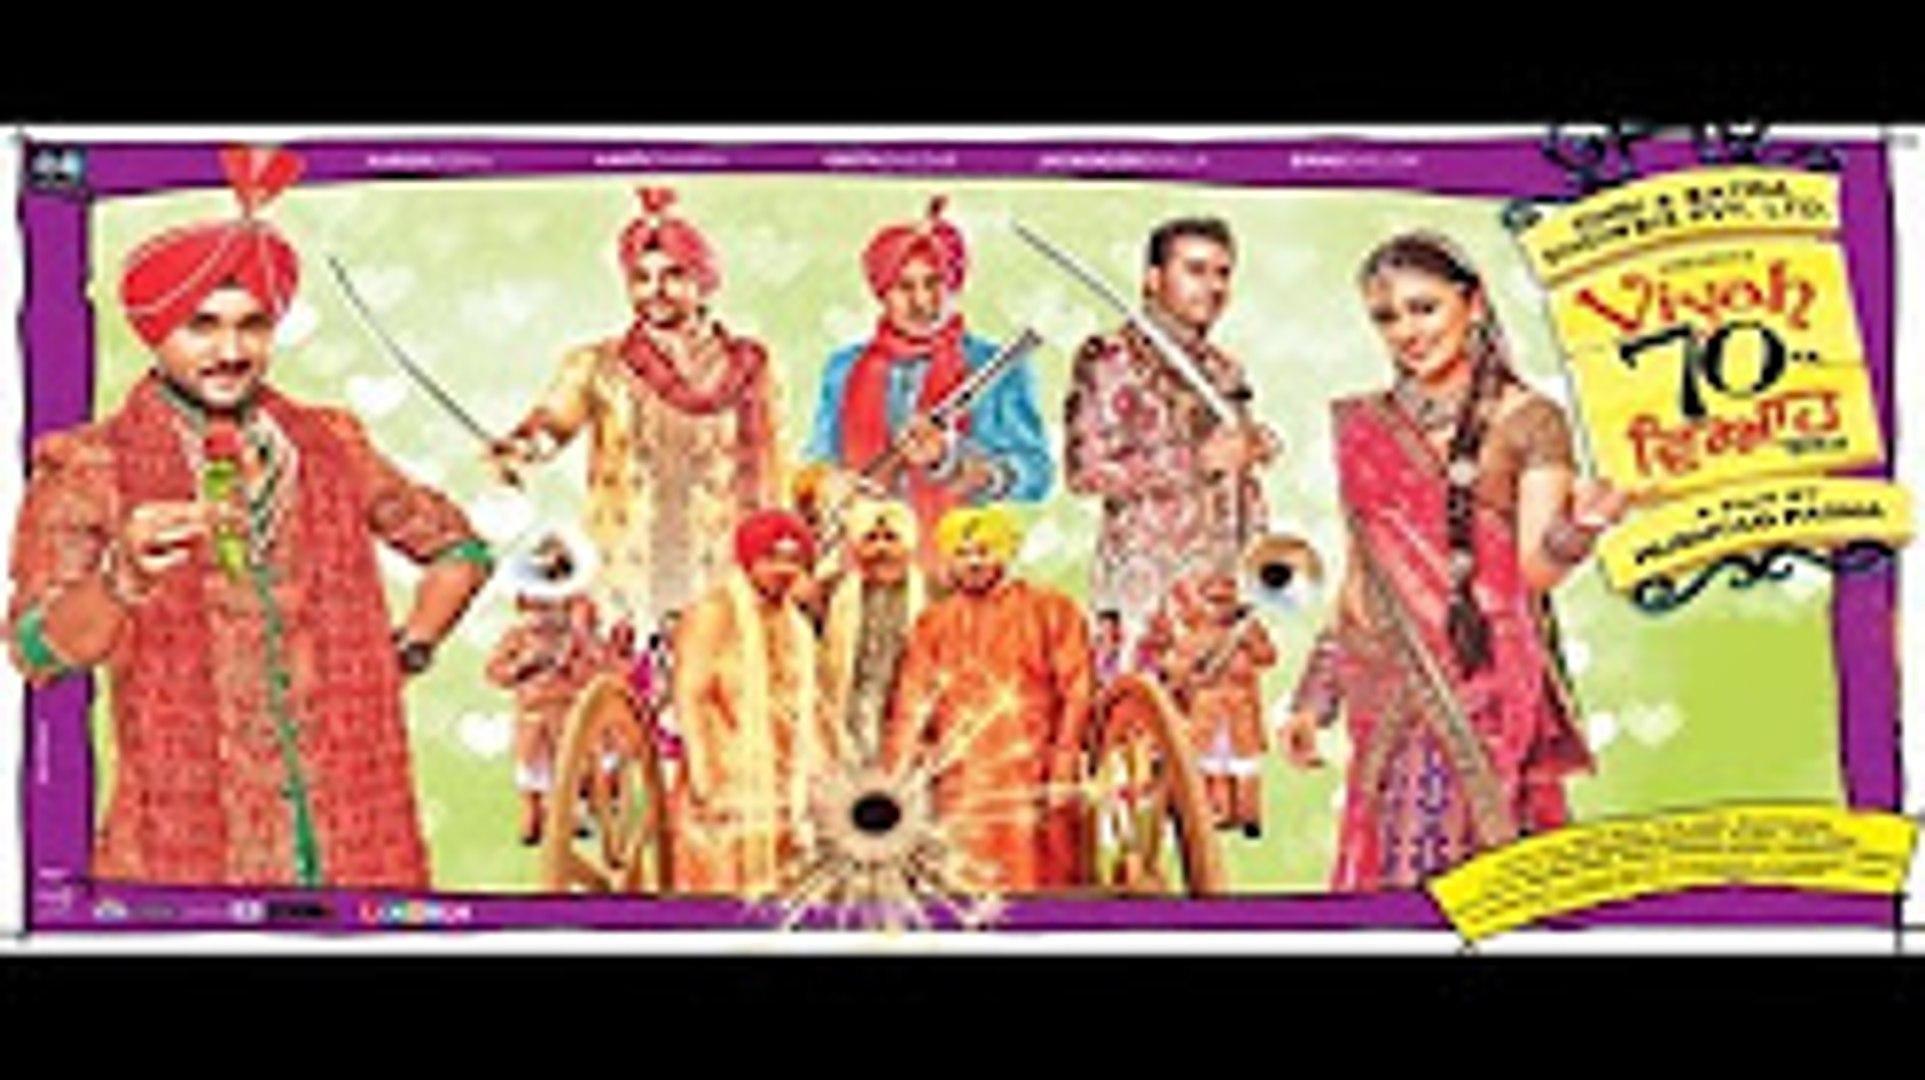 Viyah 70 KM   FULL HD Part 1   New Full Punjabi Movie   Latest Punjabi movie   Super Hit Punjabi Mov